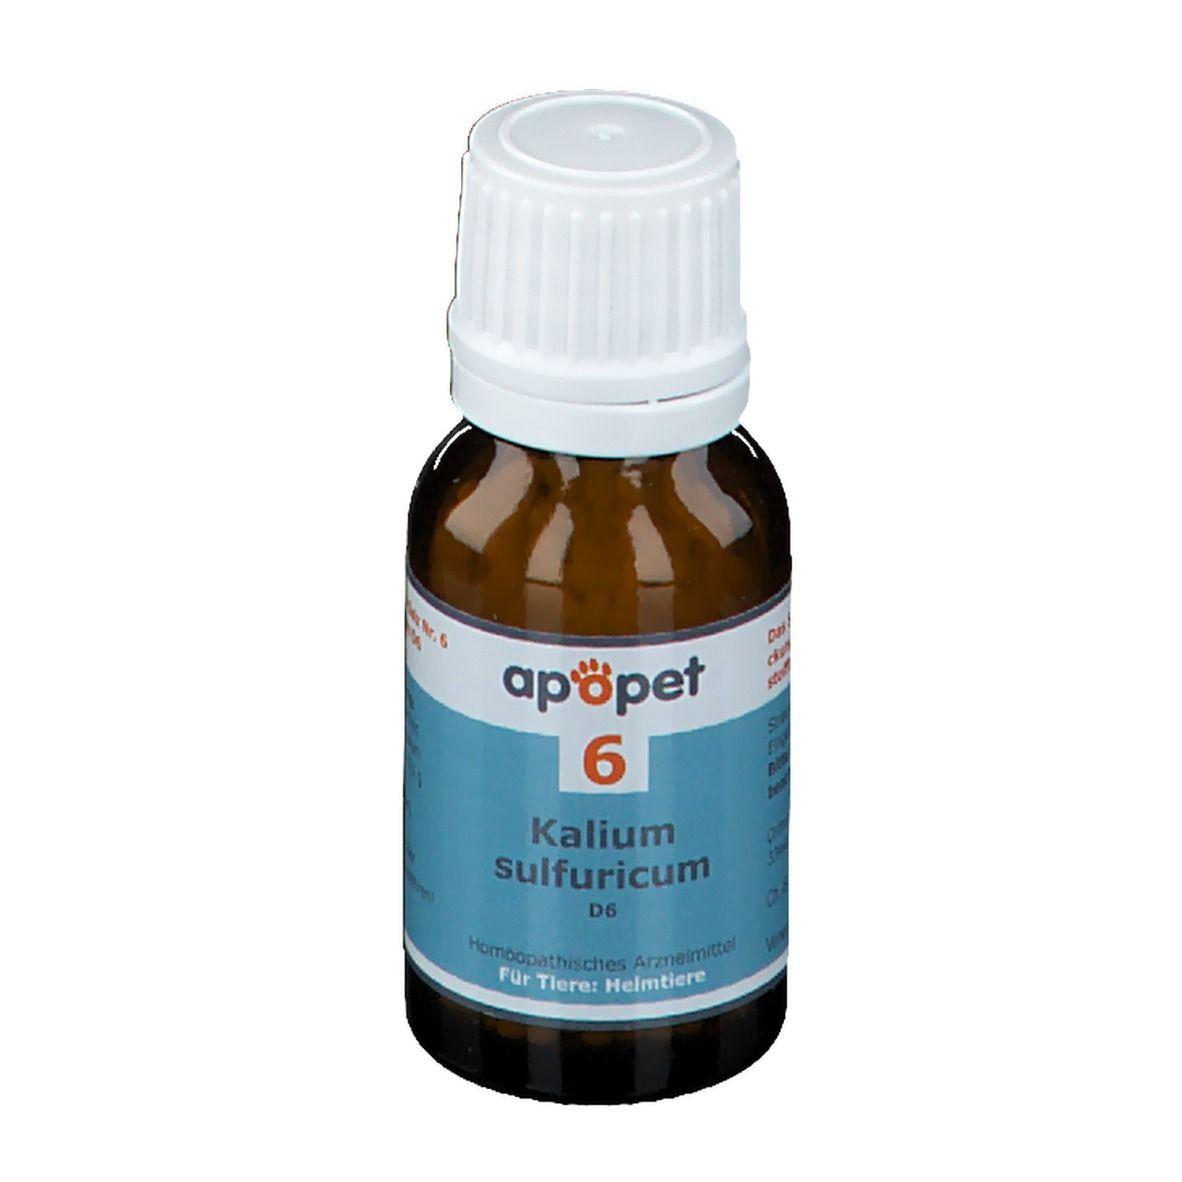 apopet® Schüßler Salz Nr. 6 Kalium sulfuricum D6 ad us. vet.